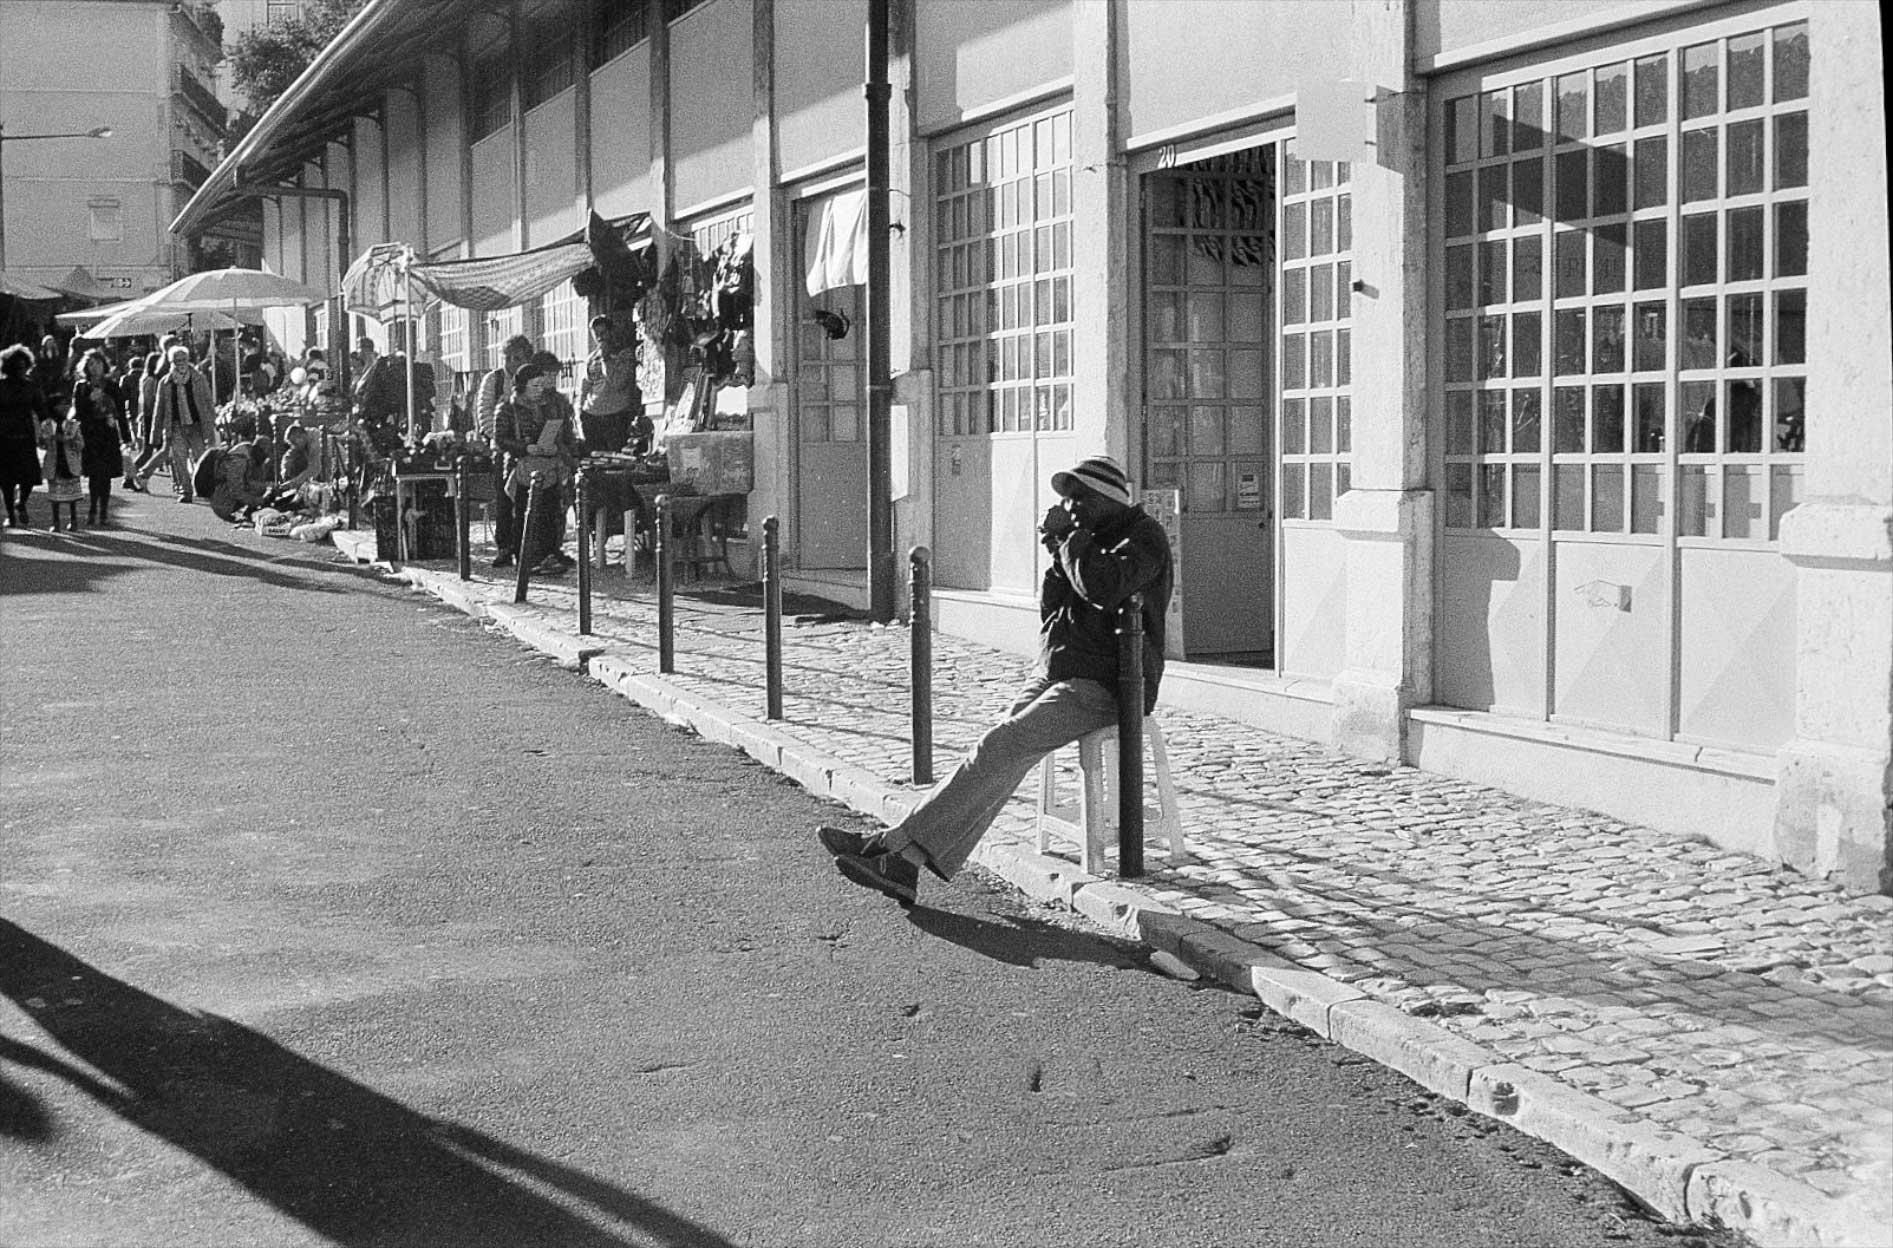 Lisbon, Portugal by Ben Everden